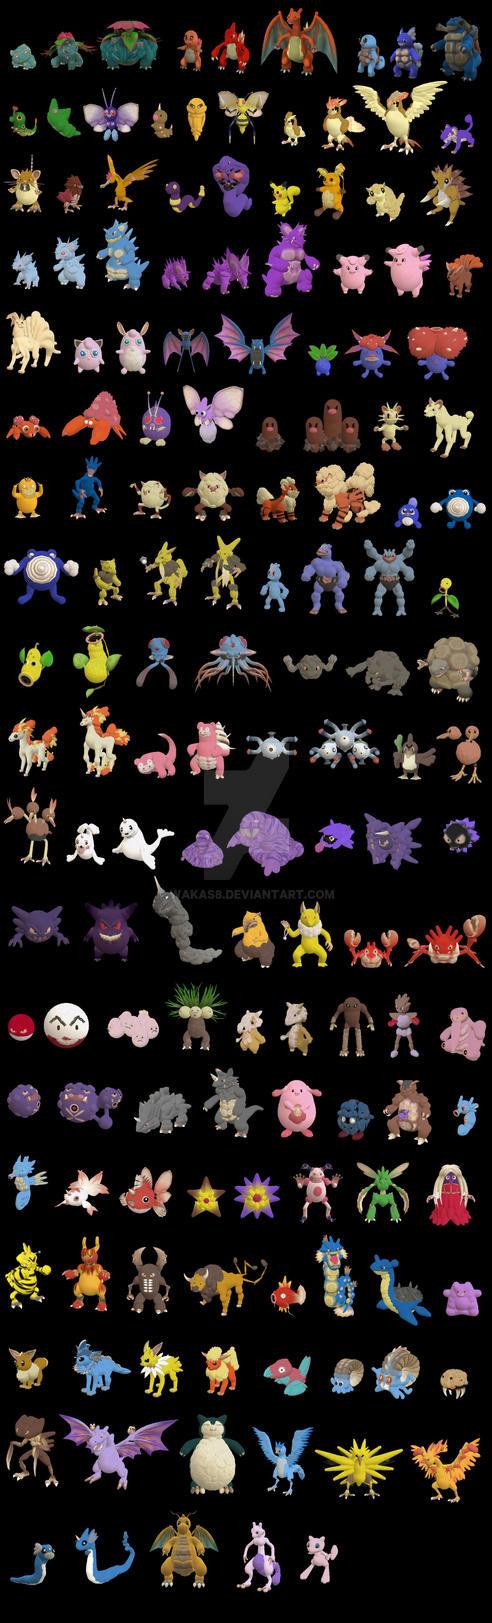 Pokemon in Spore by wakas8